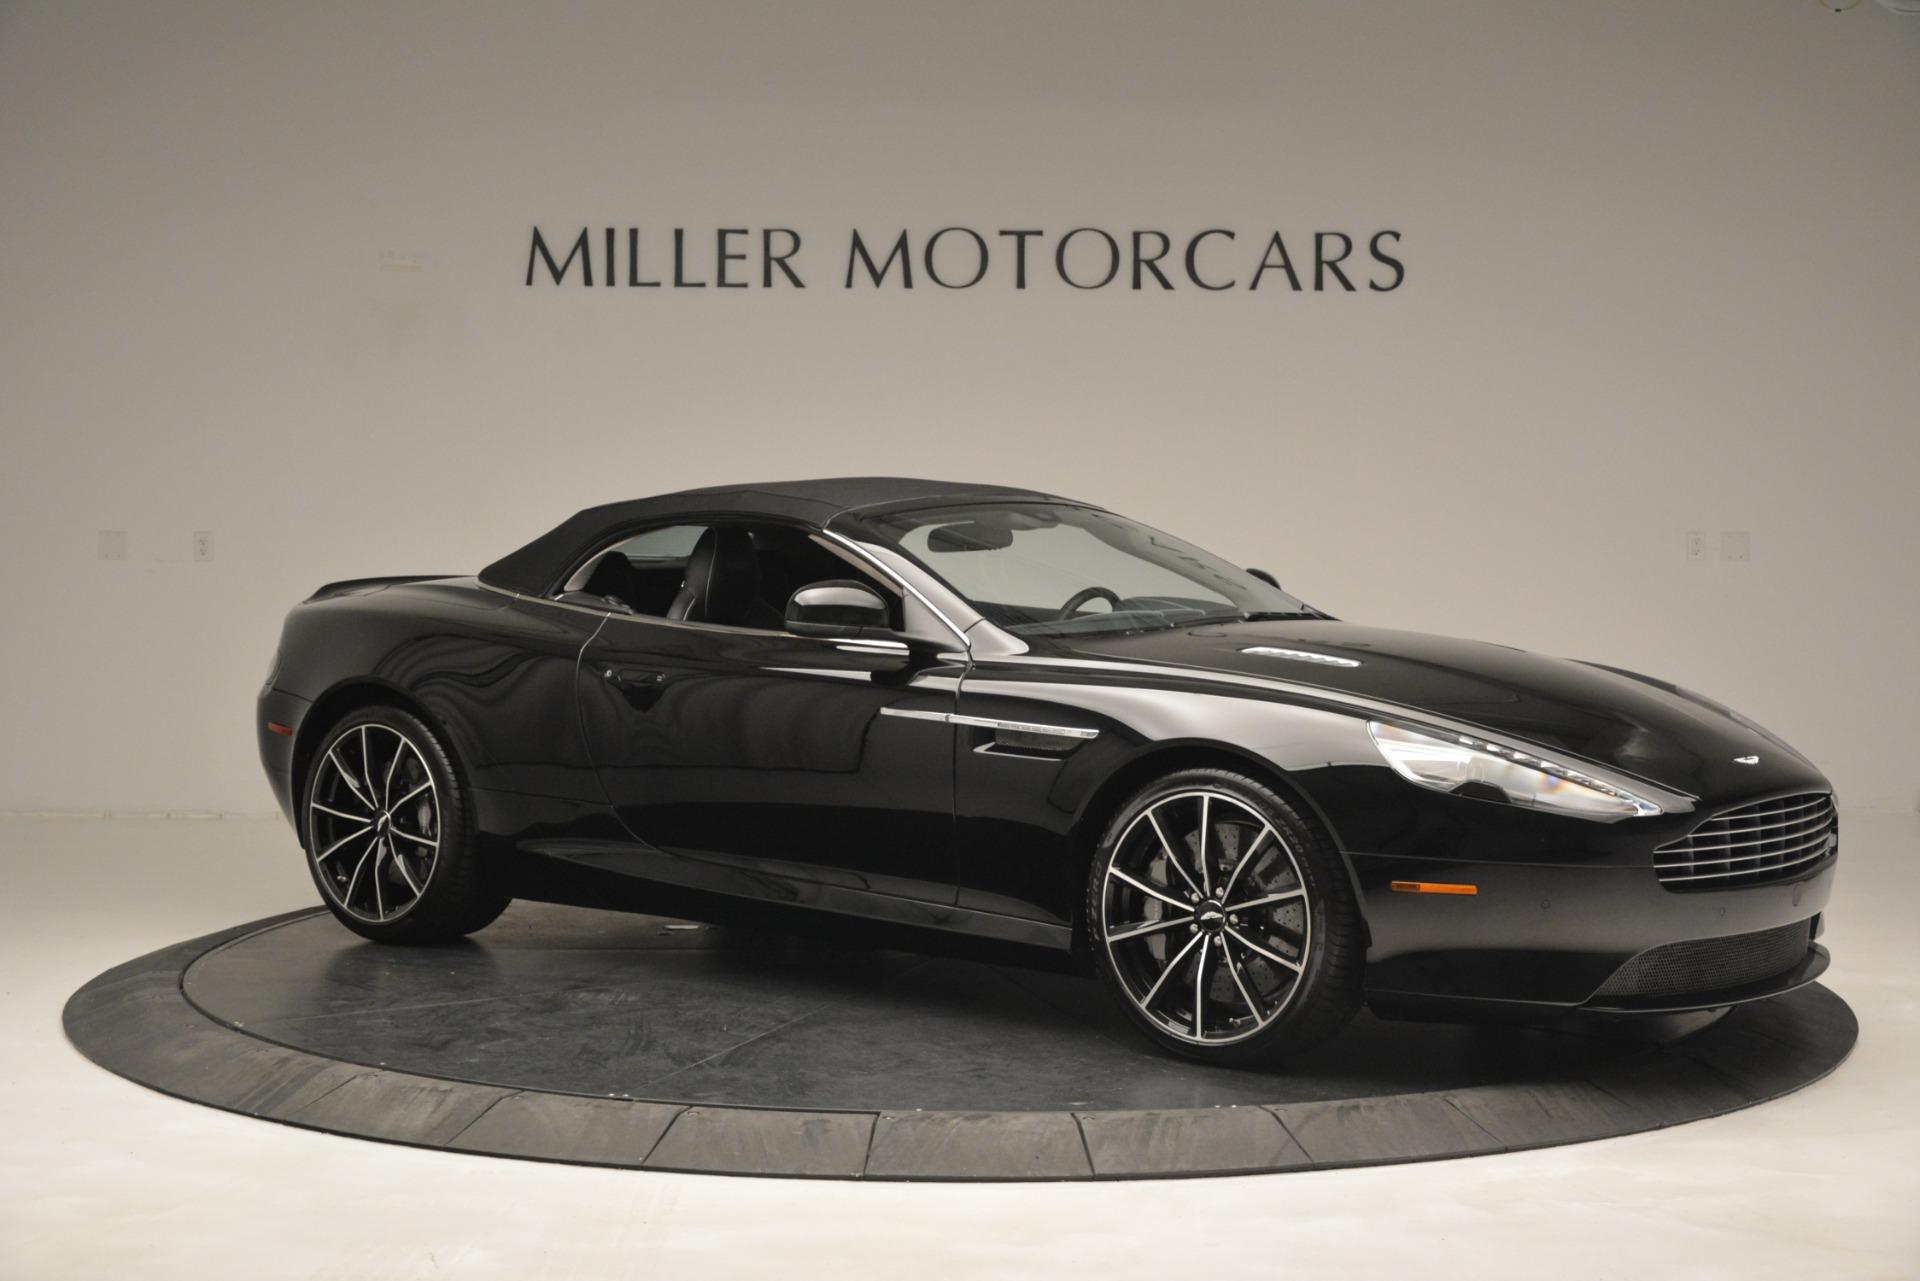 Used 2016 Aston Martin DB9 Convertible For Sale In Greenwich, CT. Alfa Romeo of Greenwich, 7495 2971_p32